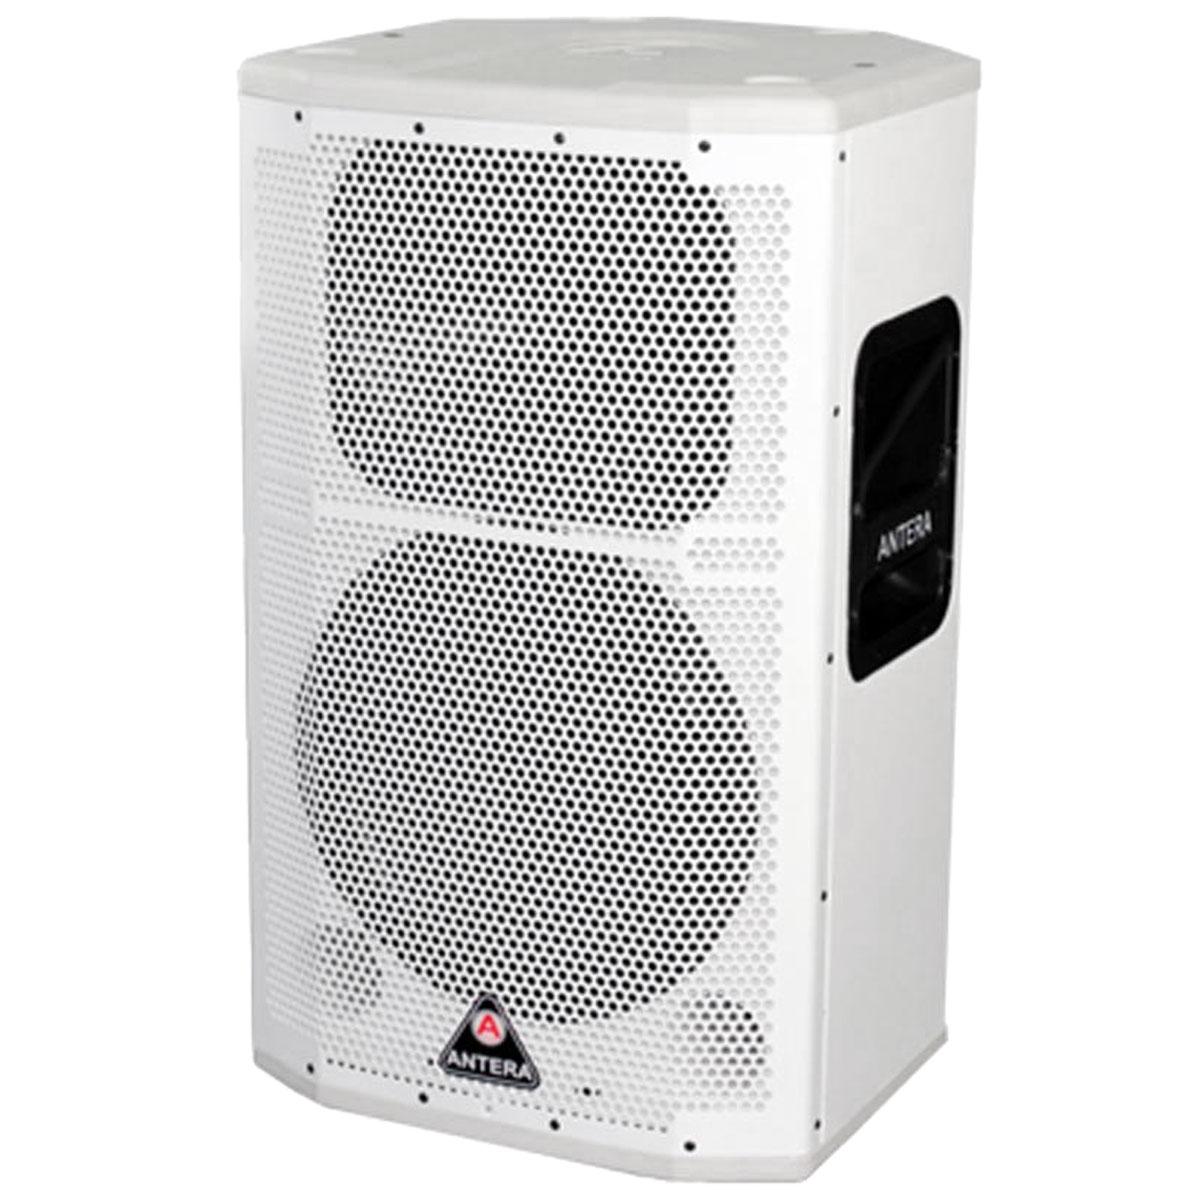 Caixa Ativa 500W Branca HPS15A - Antera